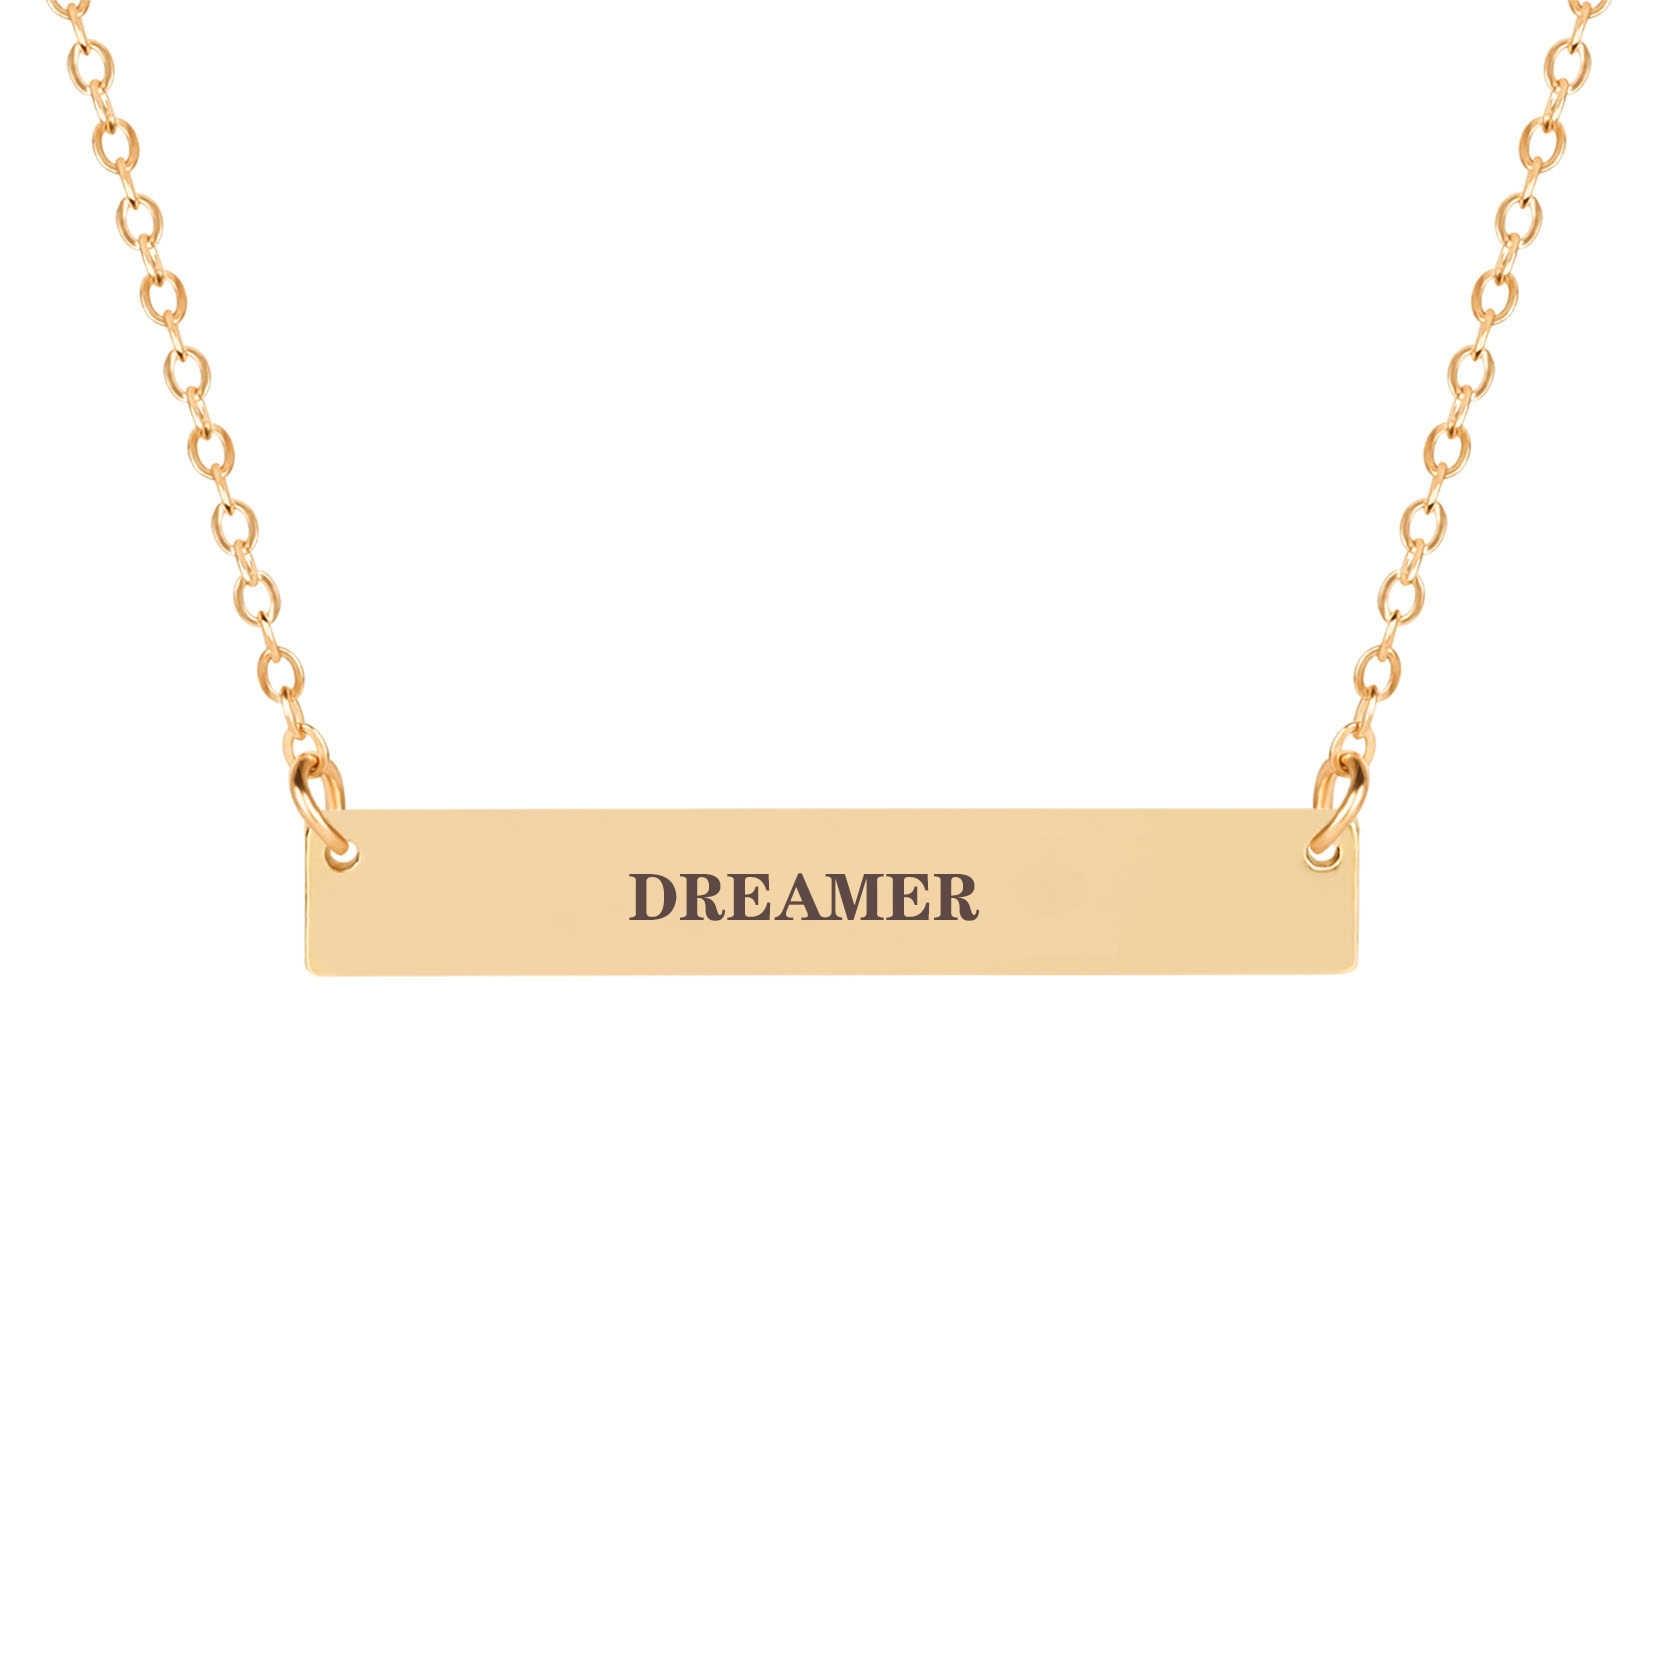 KCALOE GOLD สีสร้อยคอผู้หญิงจี้สร้อยคอของขวัญชาติพันธุ์ Bohemian Choker สร้อยคอเชื่อของขวัญ